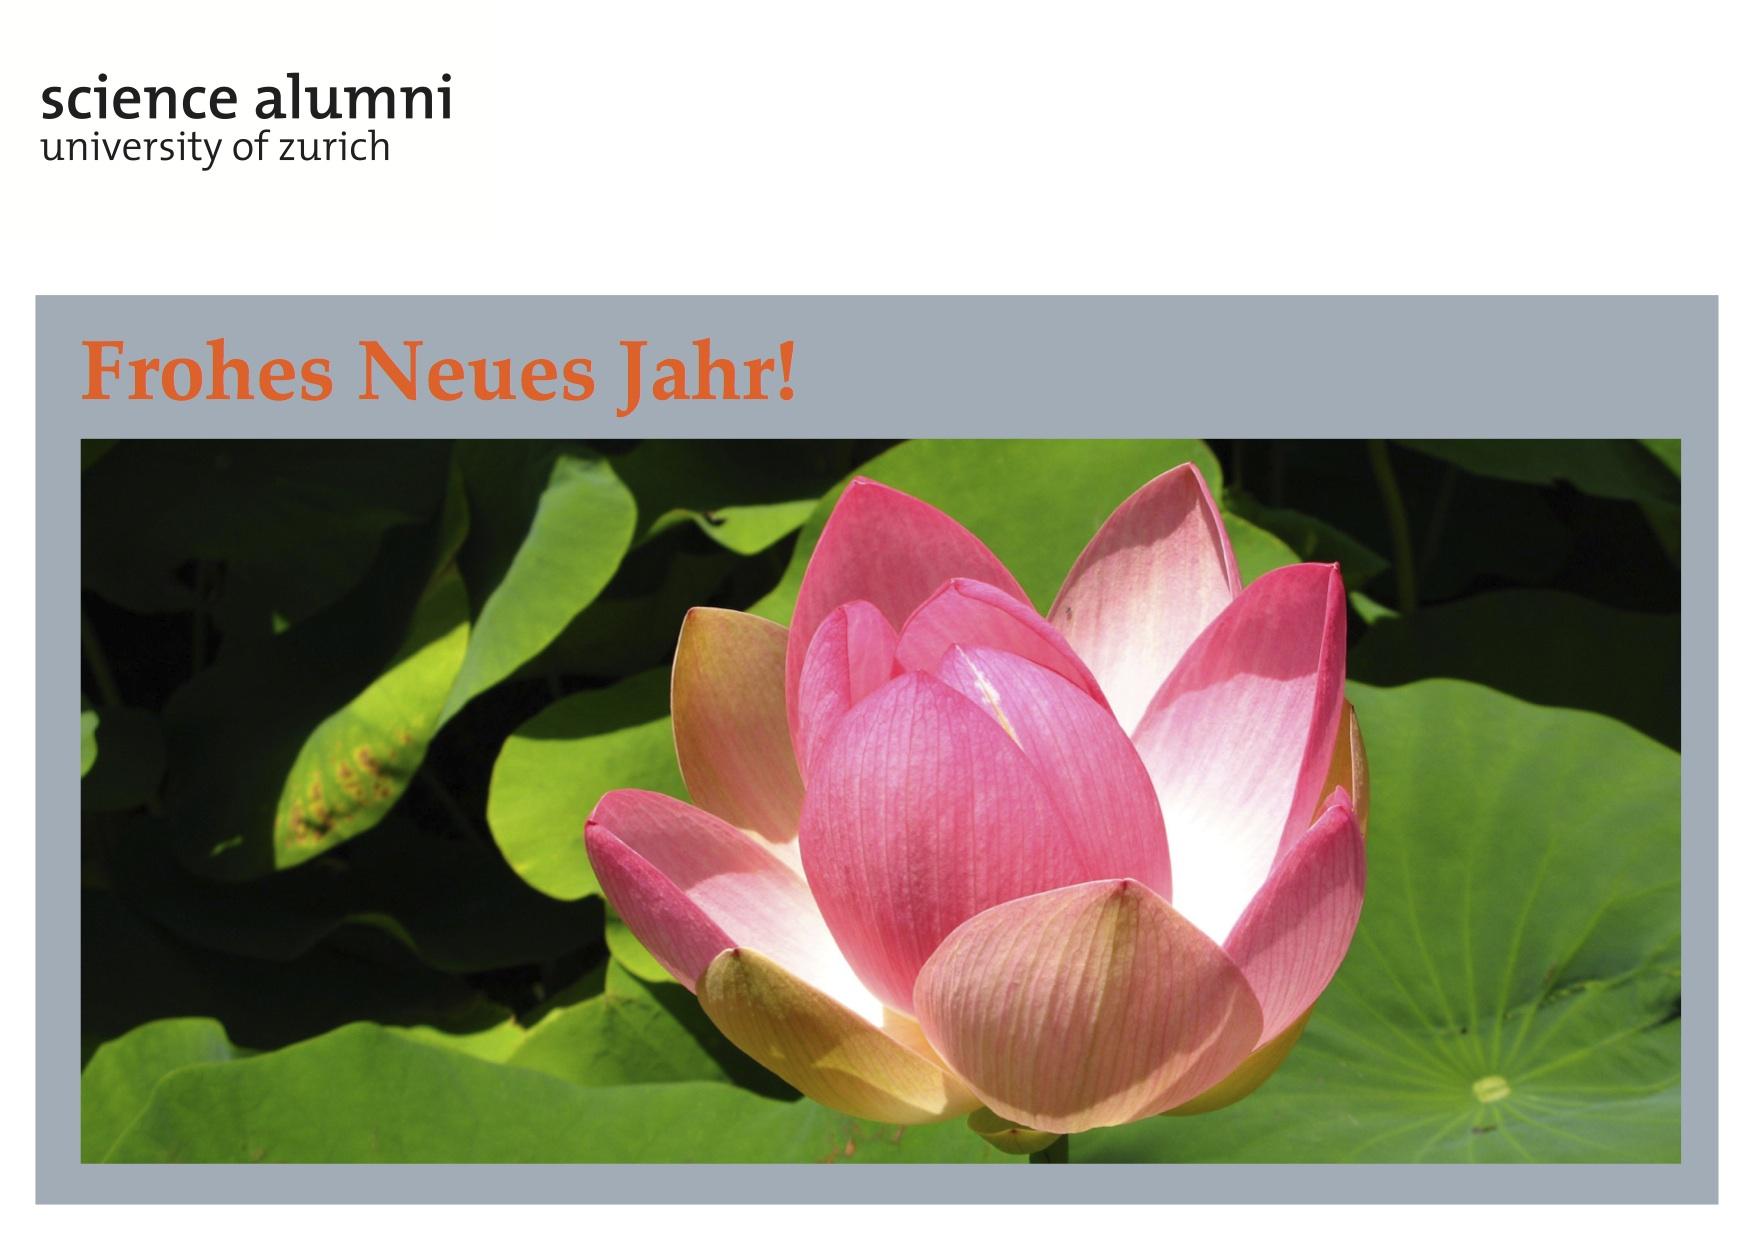 UZH - Science Alumni UZH - Frohes Neues Jahr 2013!